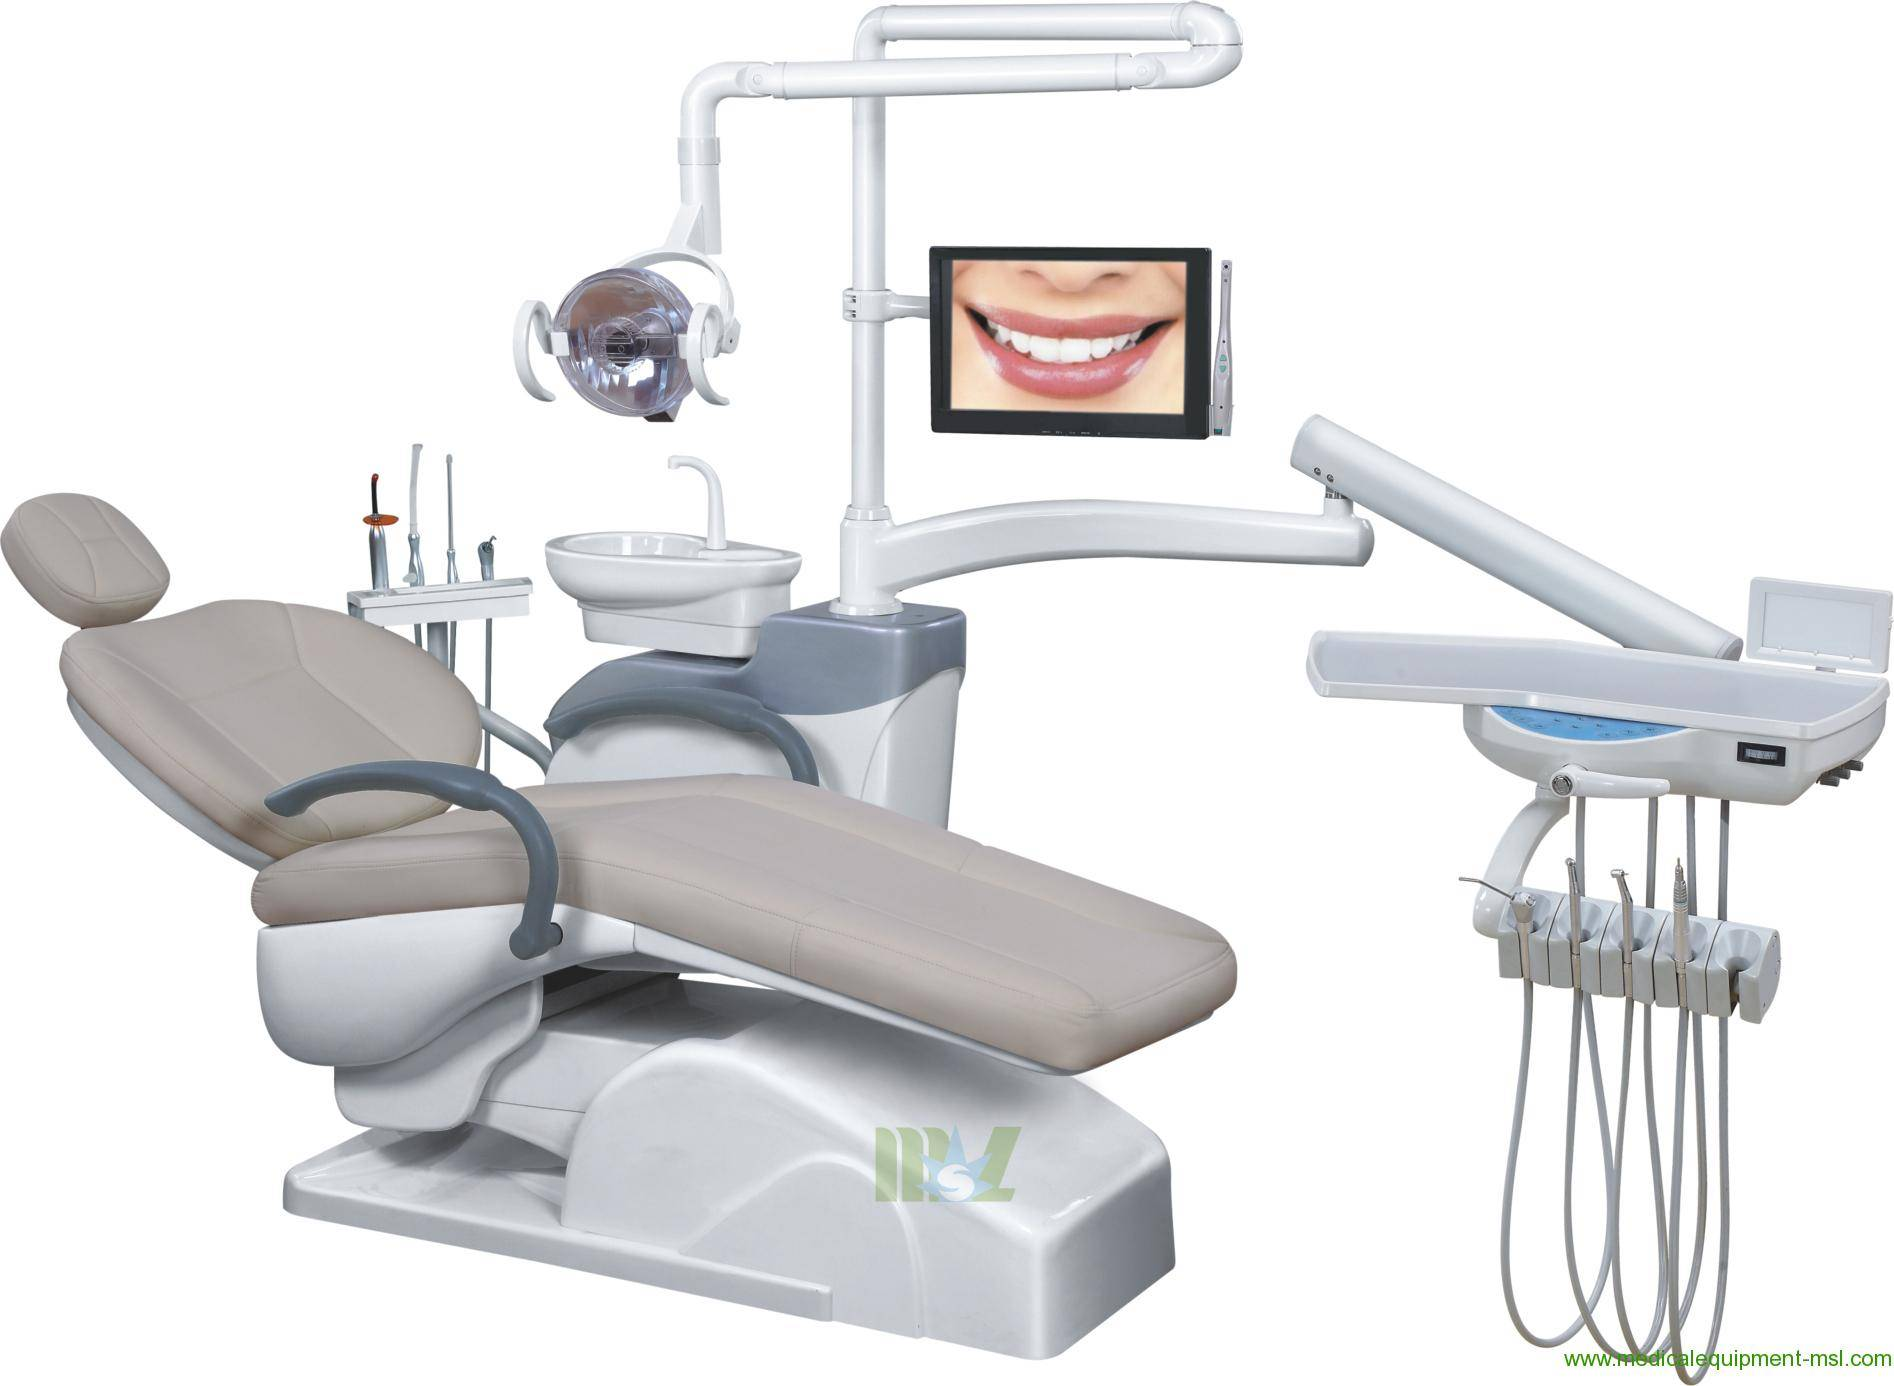 top-mounted dental chair | ergonomic dental chair MSLDU17 for sale